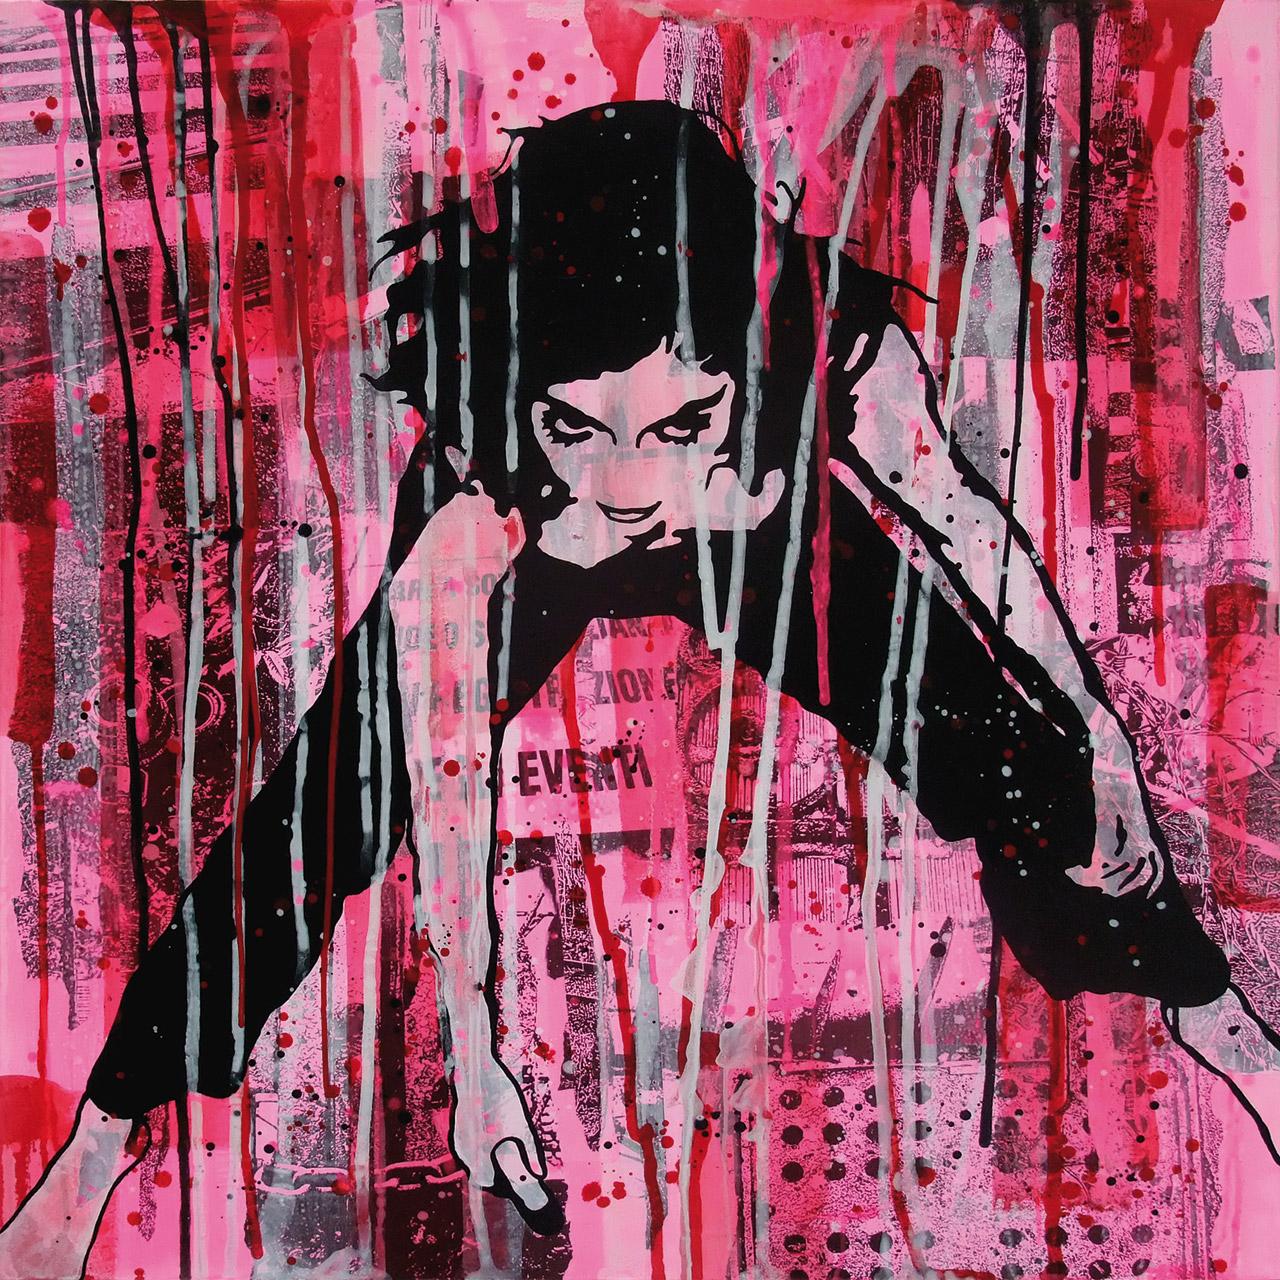 Airone - Street Blossom - Mixed media on canvas 100x100 - 2010